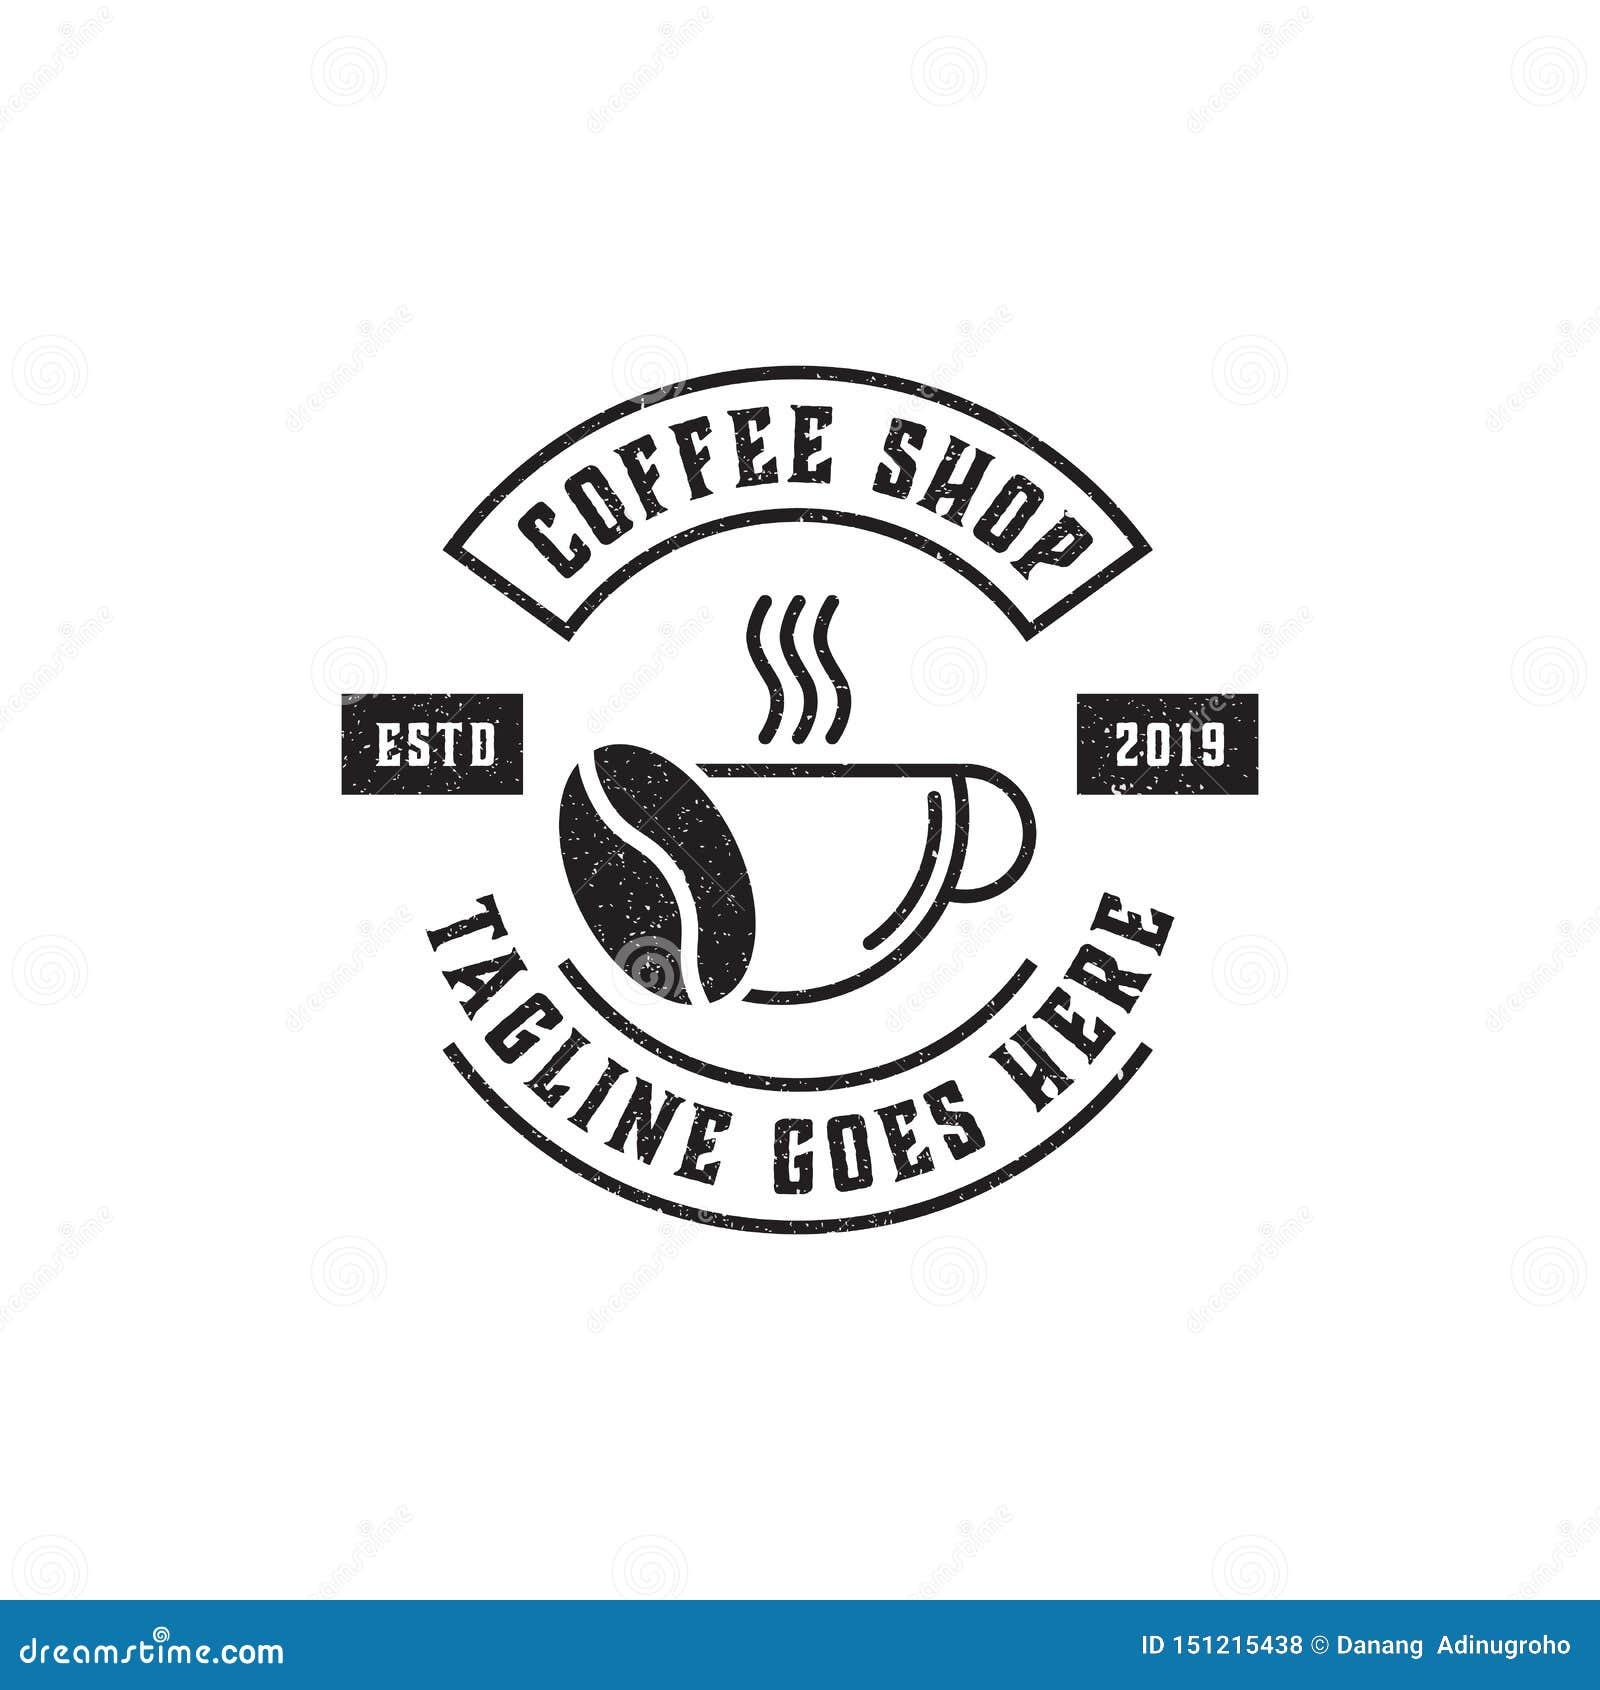 Premium Coffee Shop Logo Inspiration Vintage Rustic And Retro Stock Illustration Illustration Of Coffee Badge 151215438